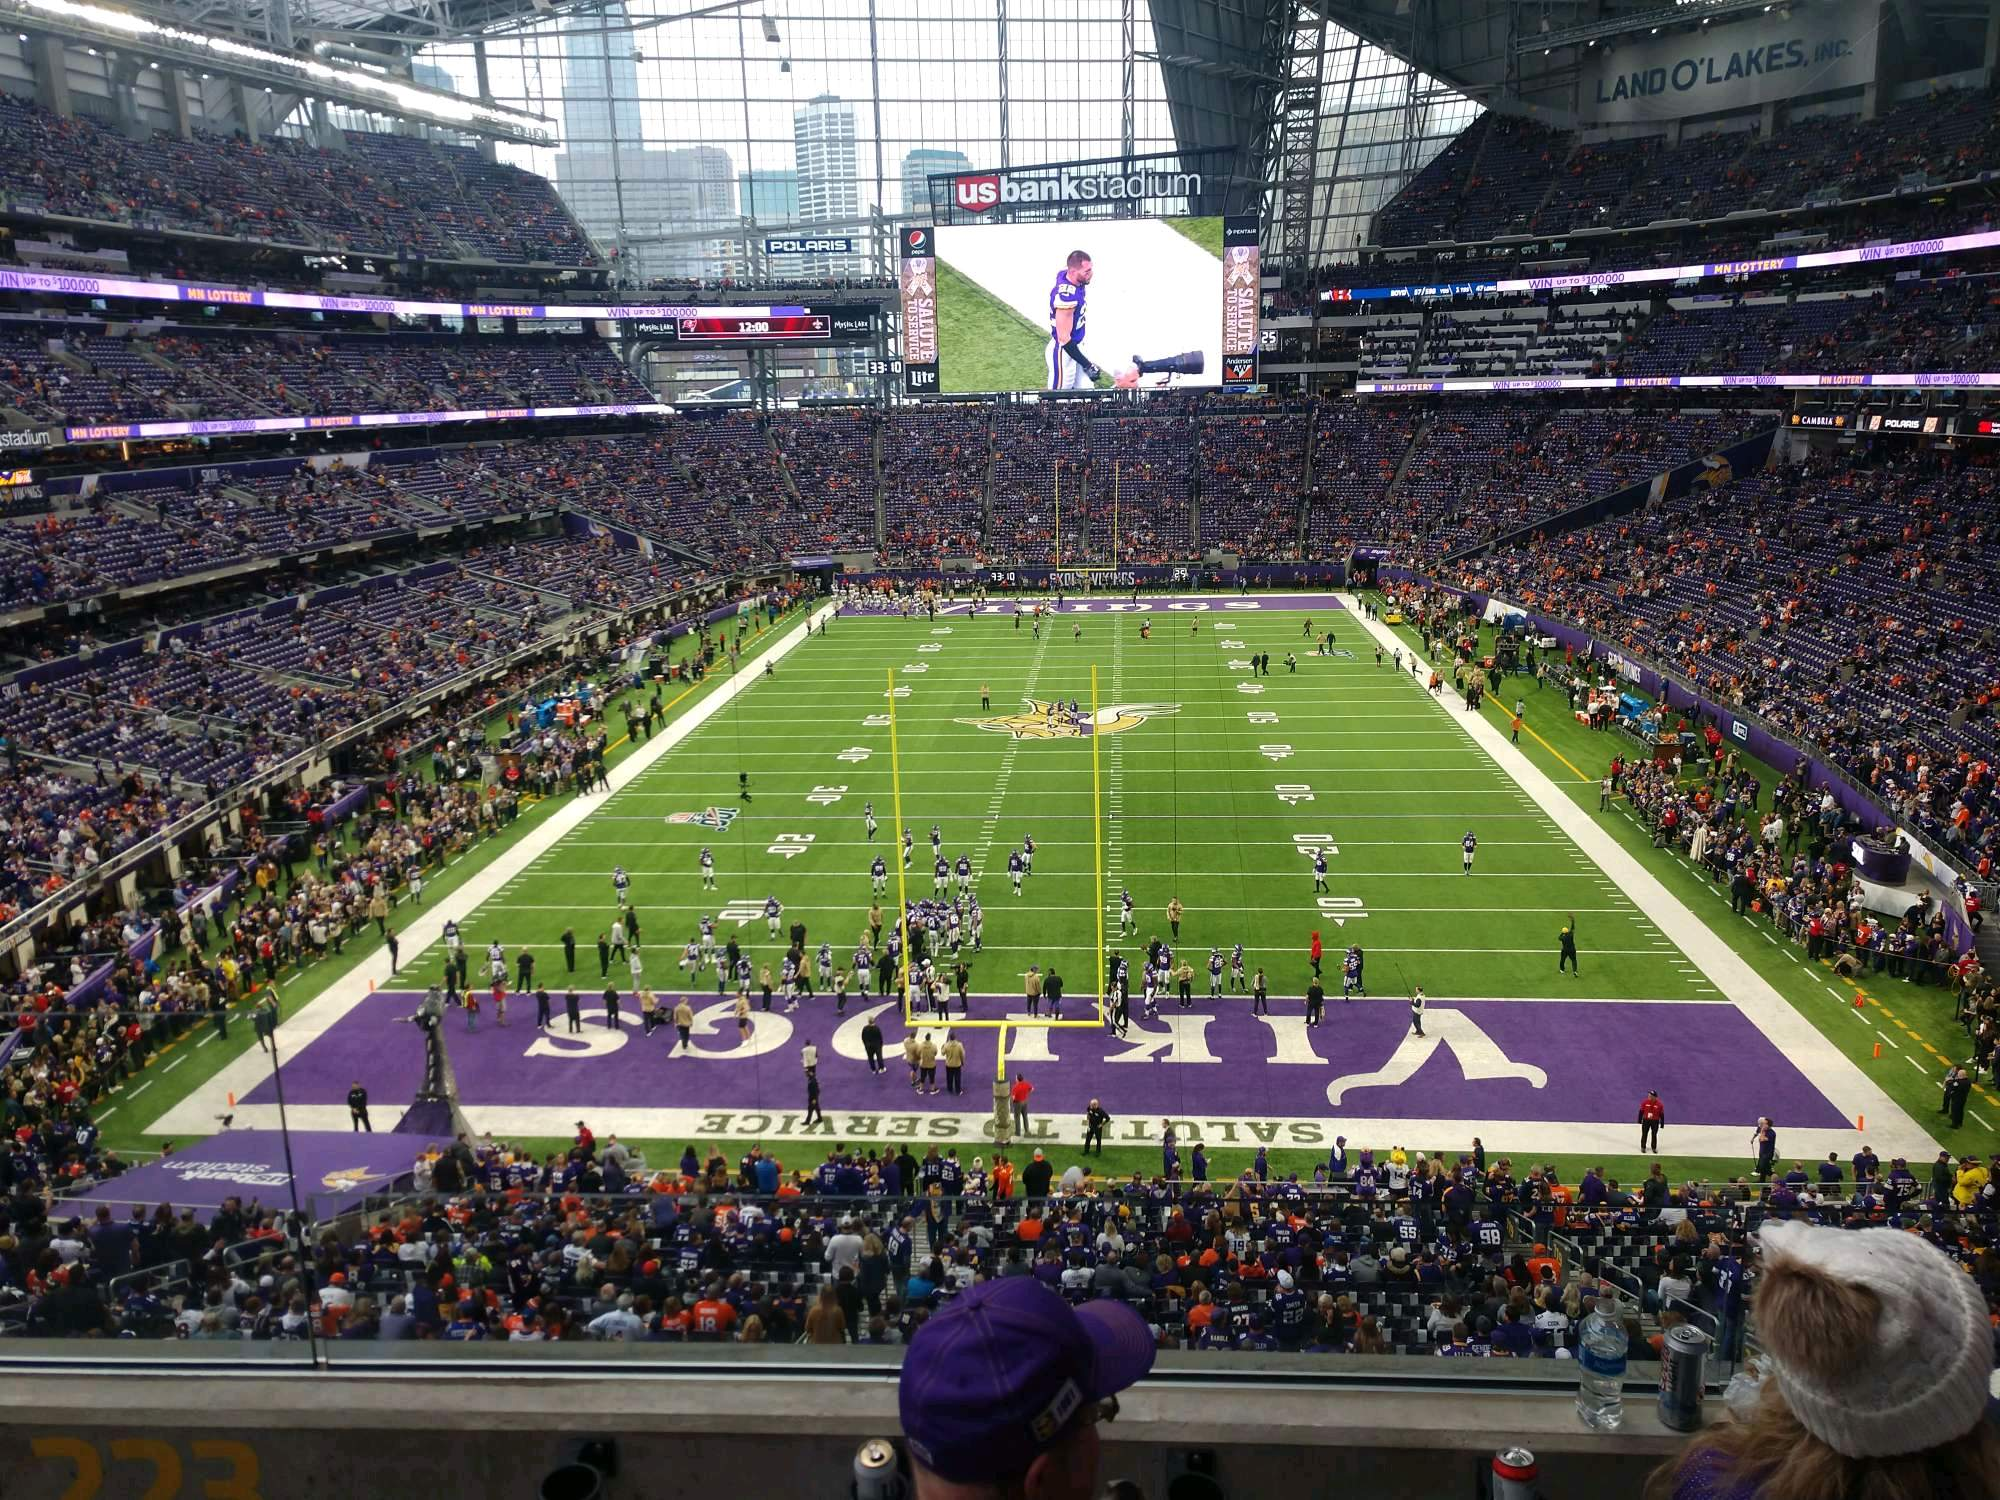 U.S. Bank Stadium Section 223 Row 3 Seat 12